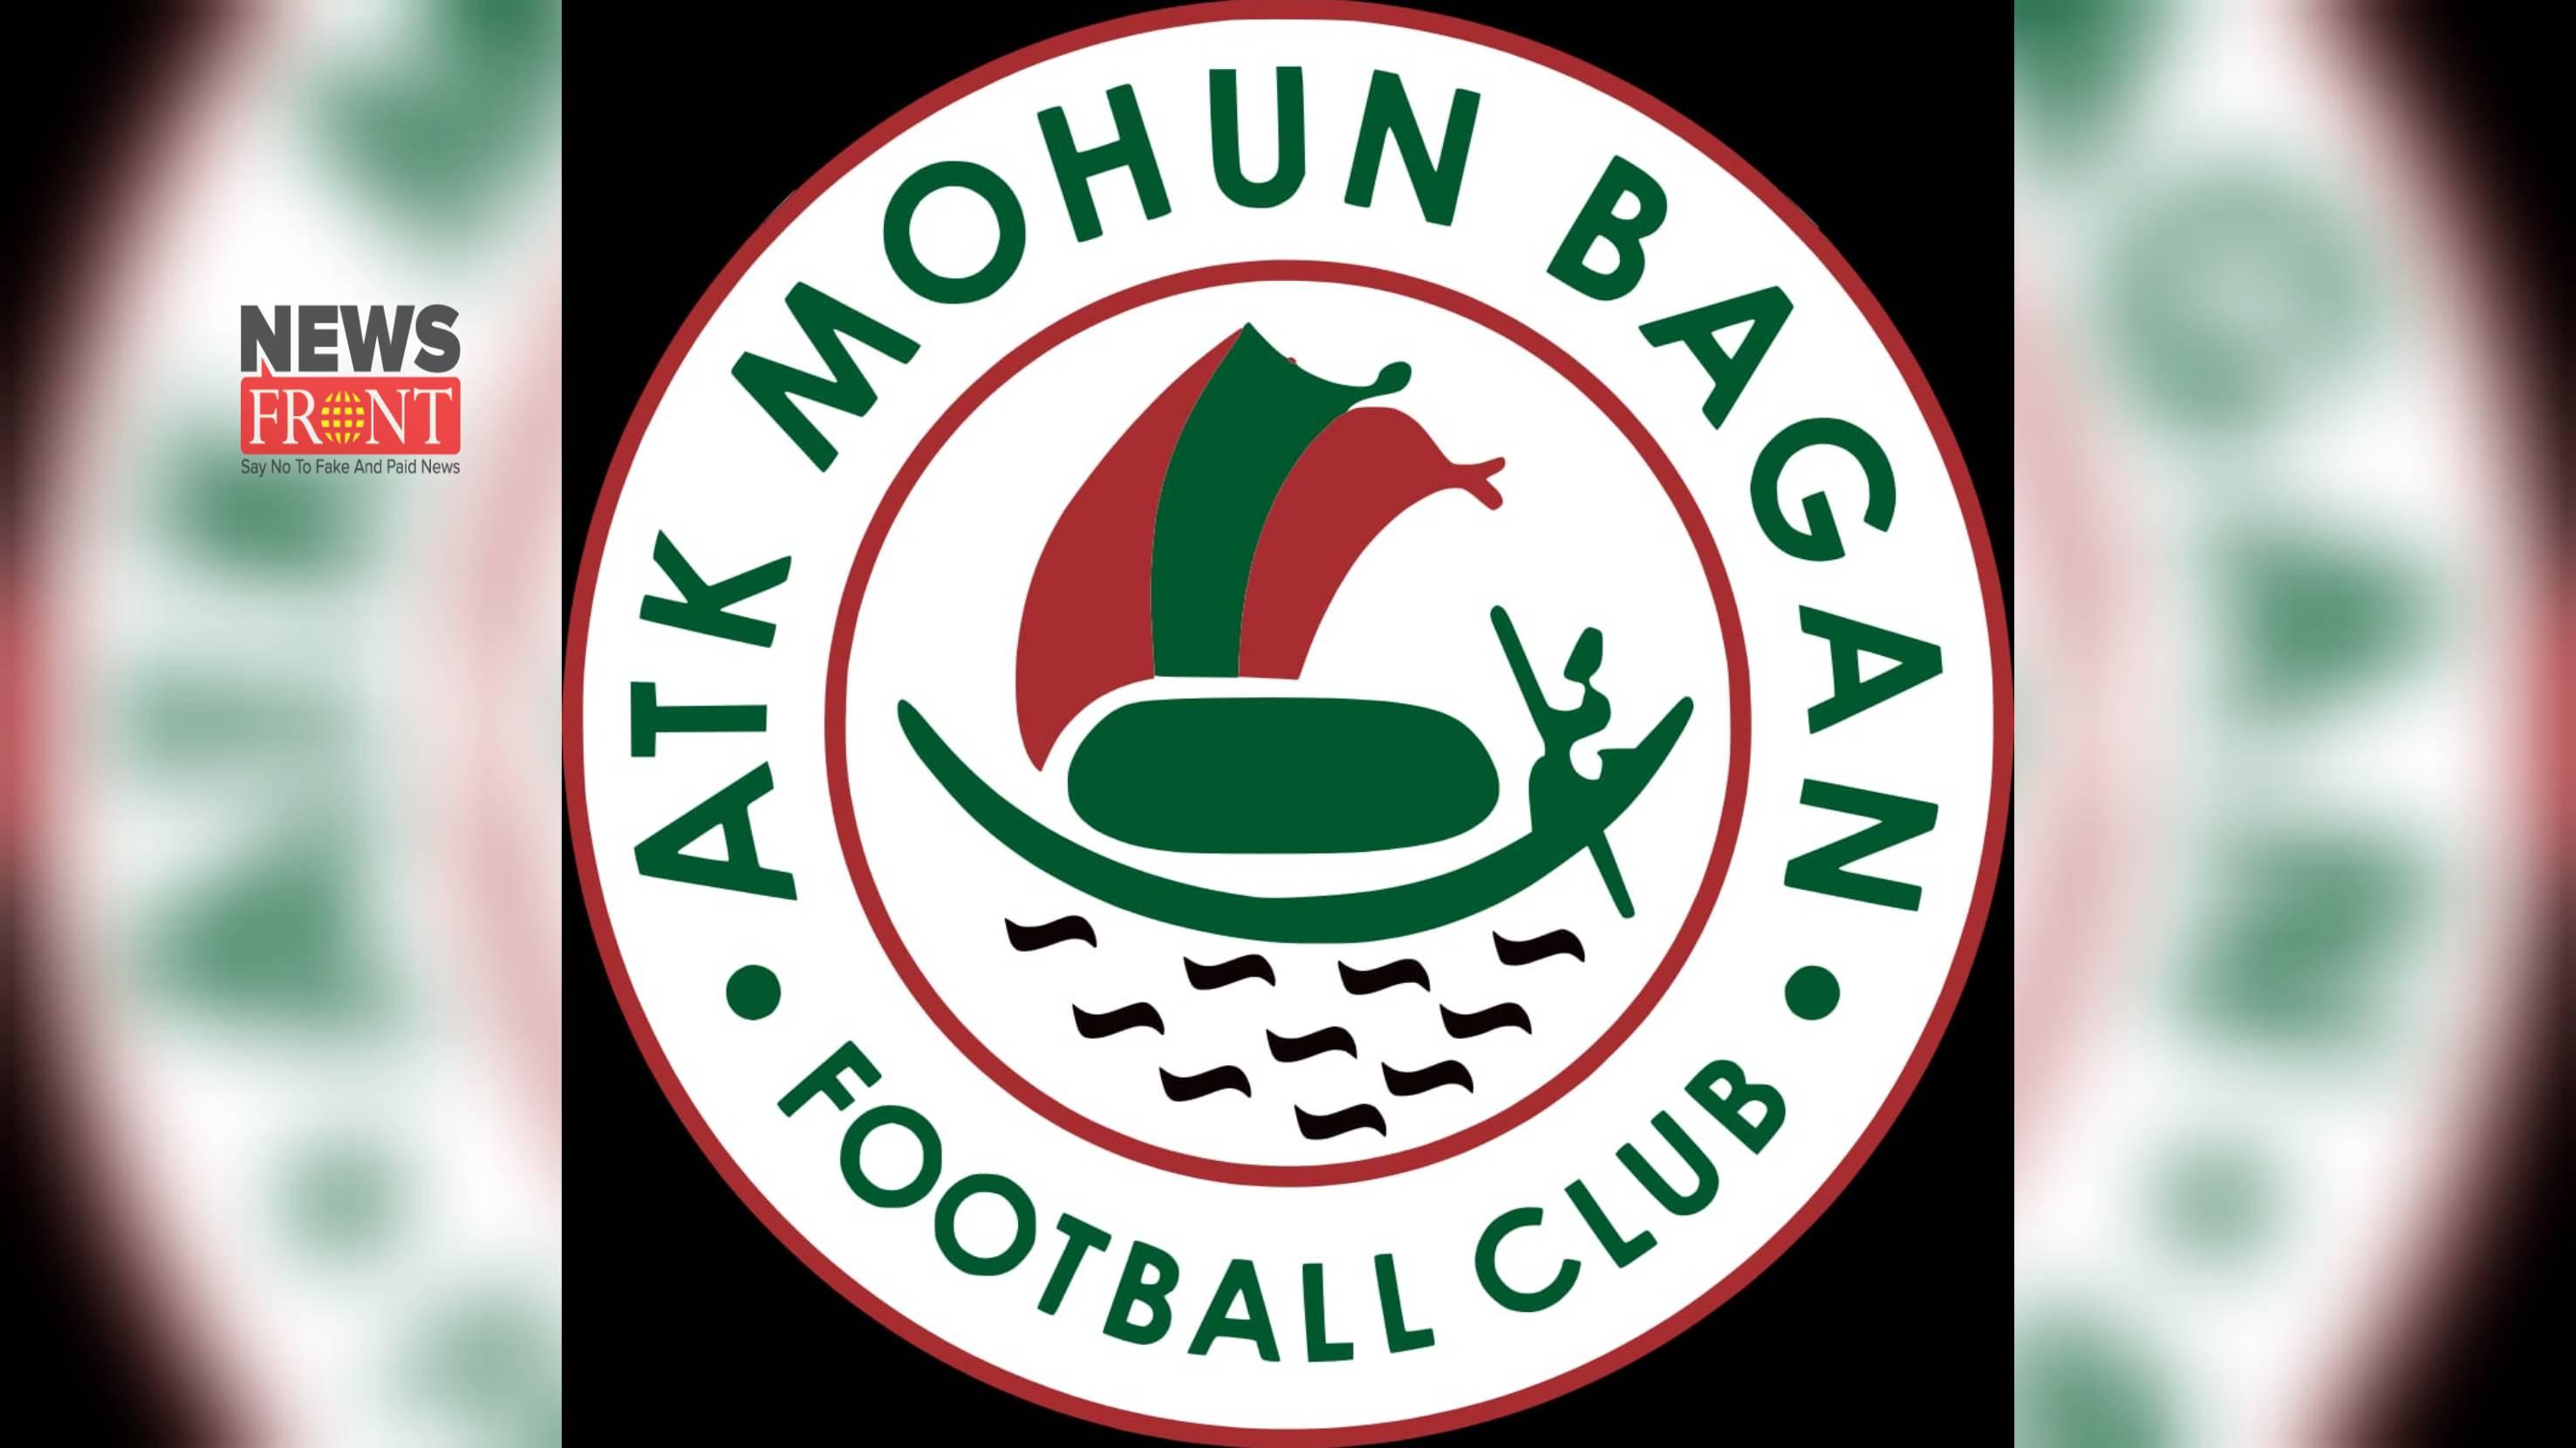 ATK Mohunbagan   newsfront.co